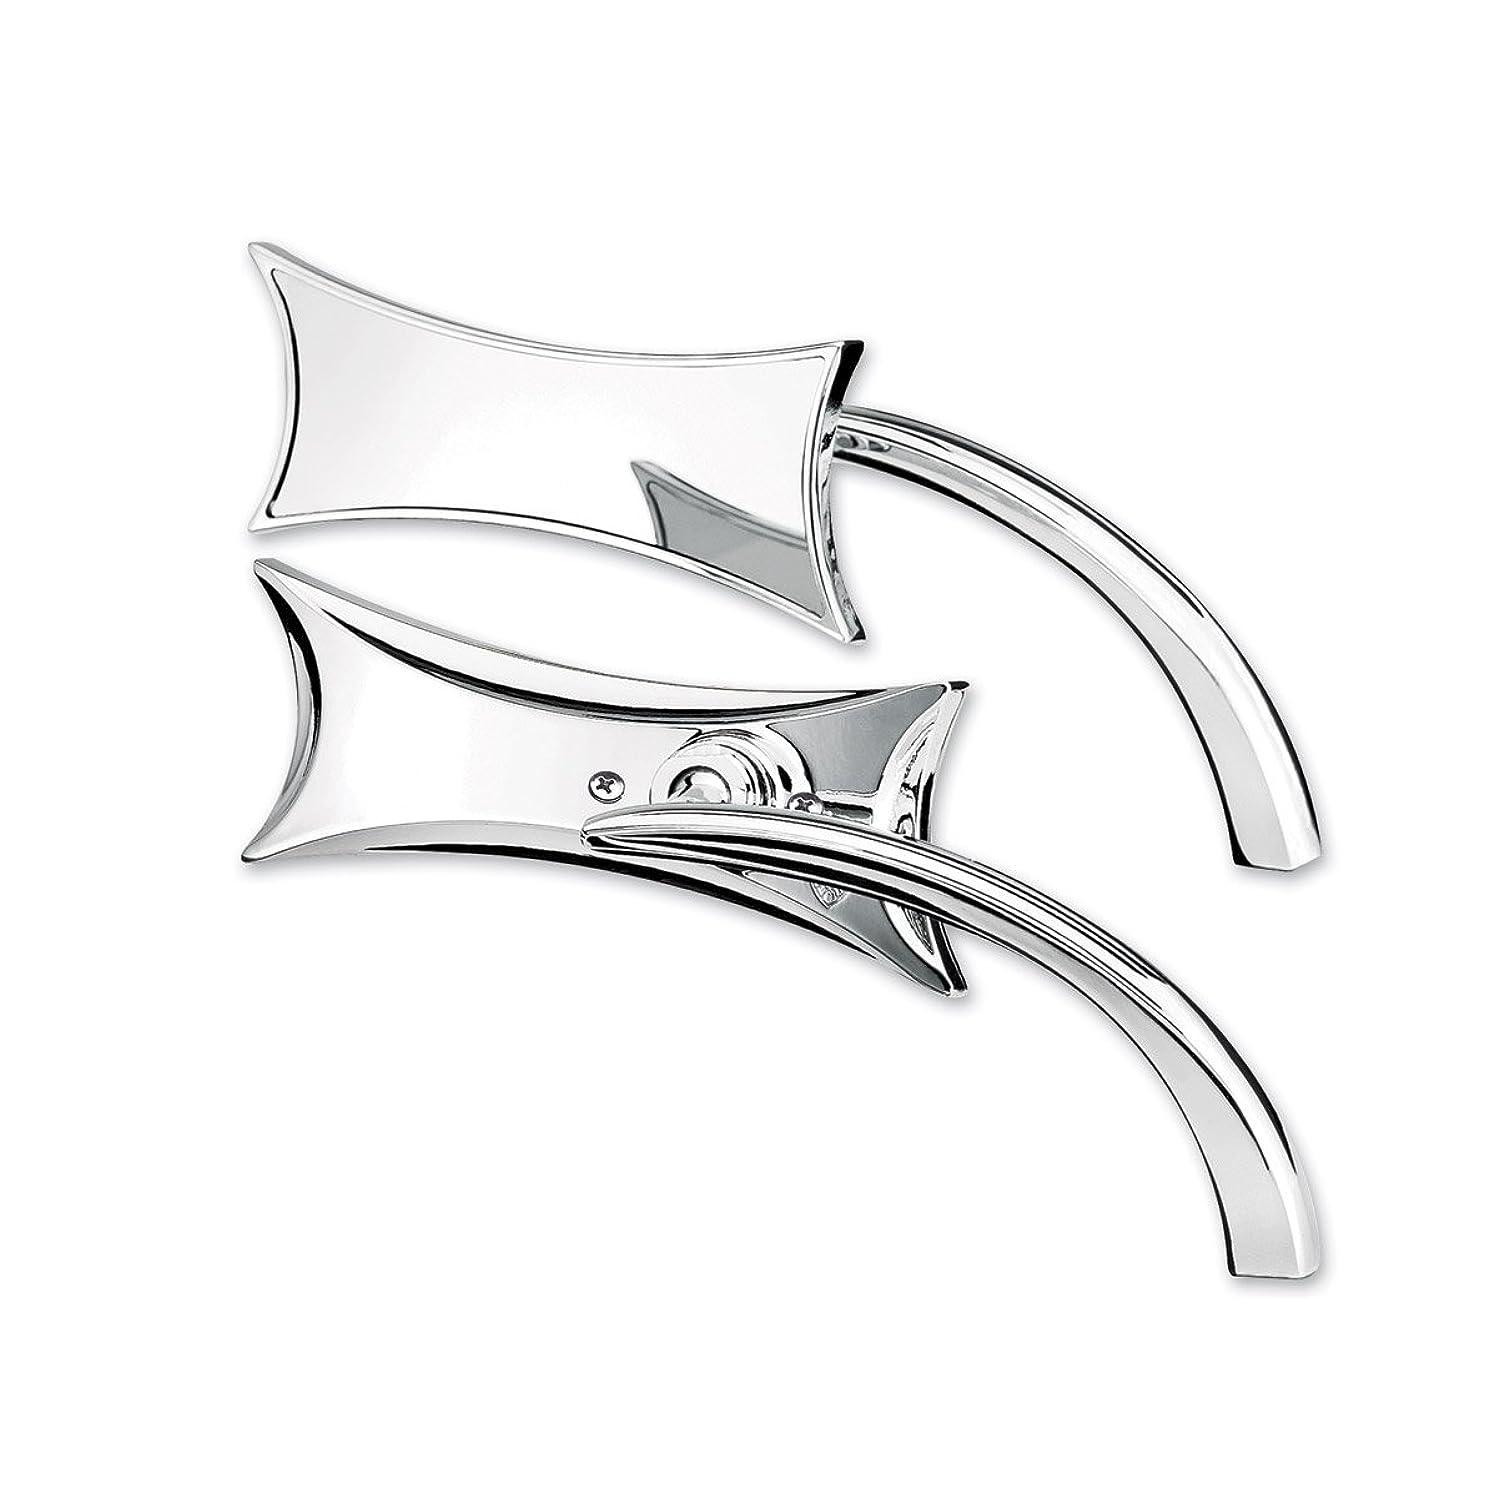 Arlen Ness 13-417 Ness Micro Mirror